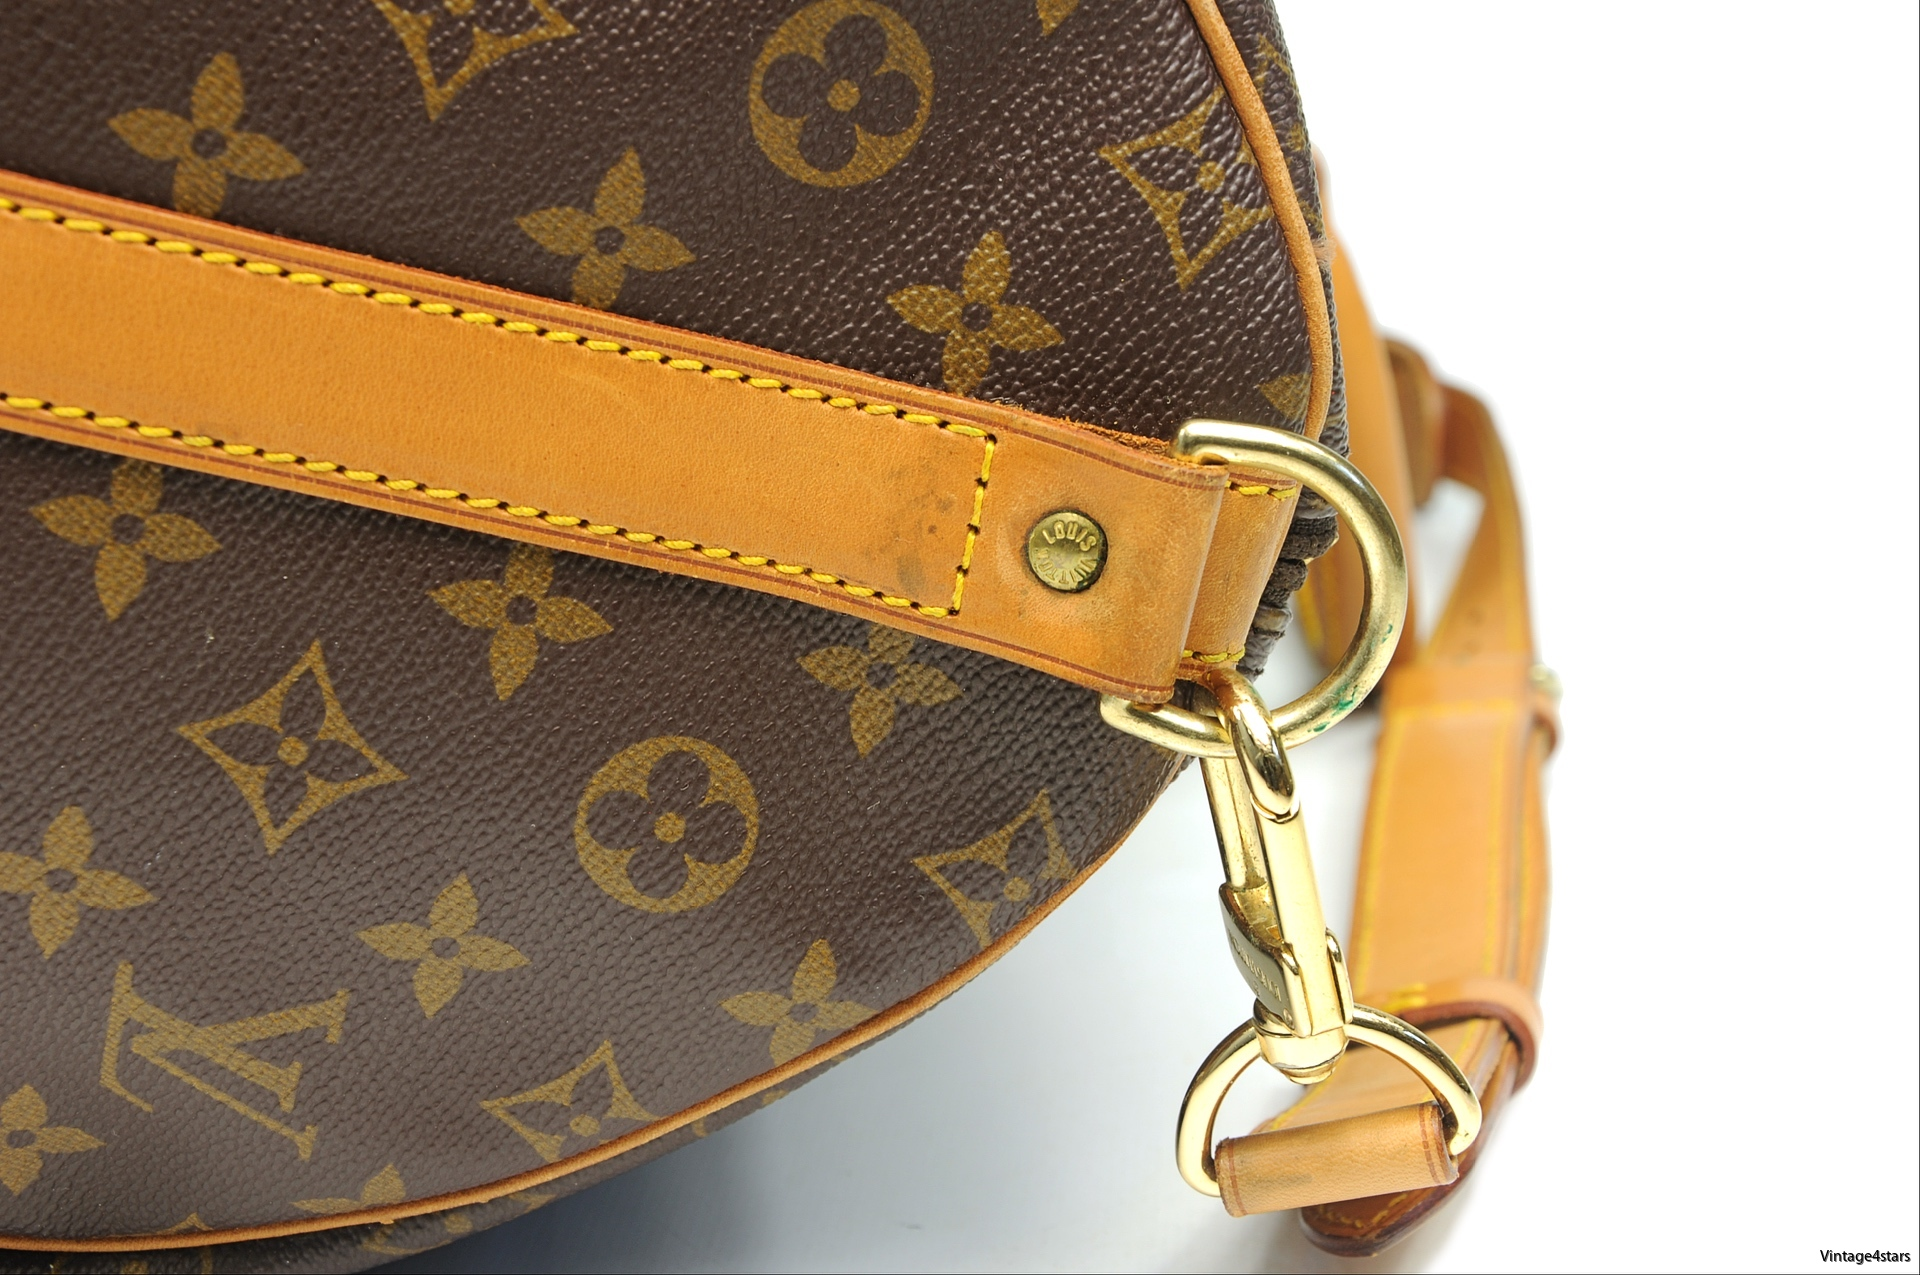 Louis Vuitton Keepall 55 Band 5a